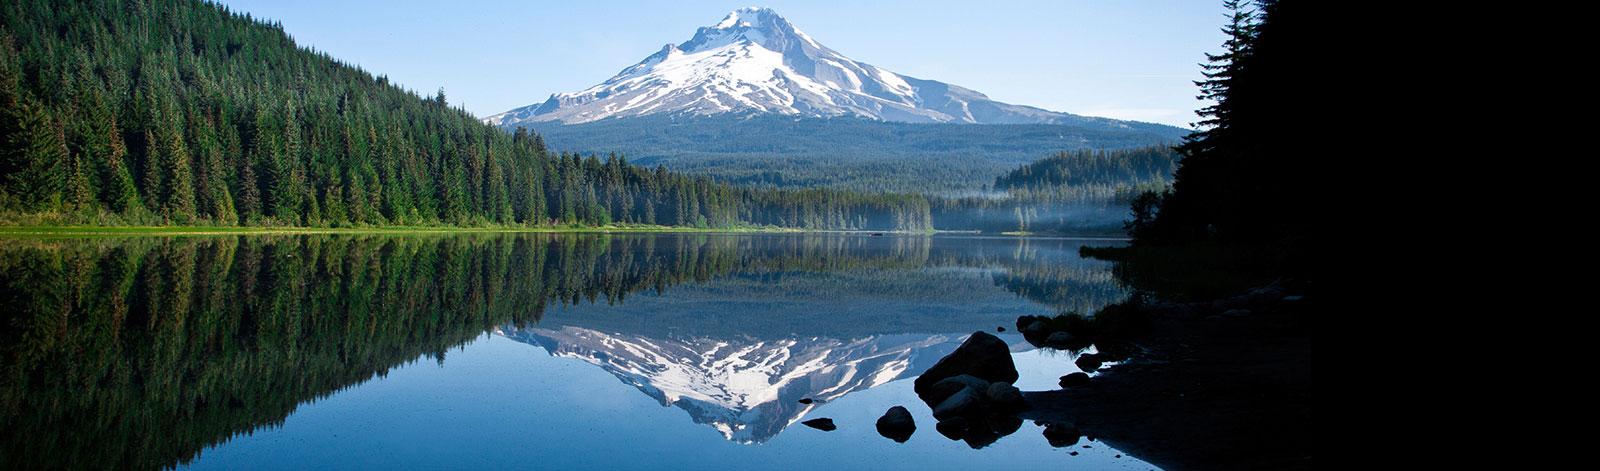 mountain_water